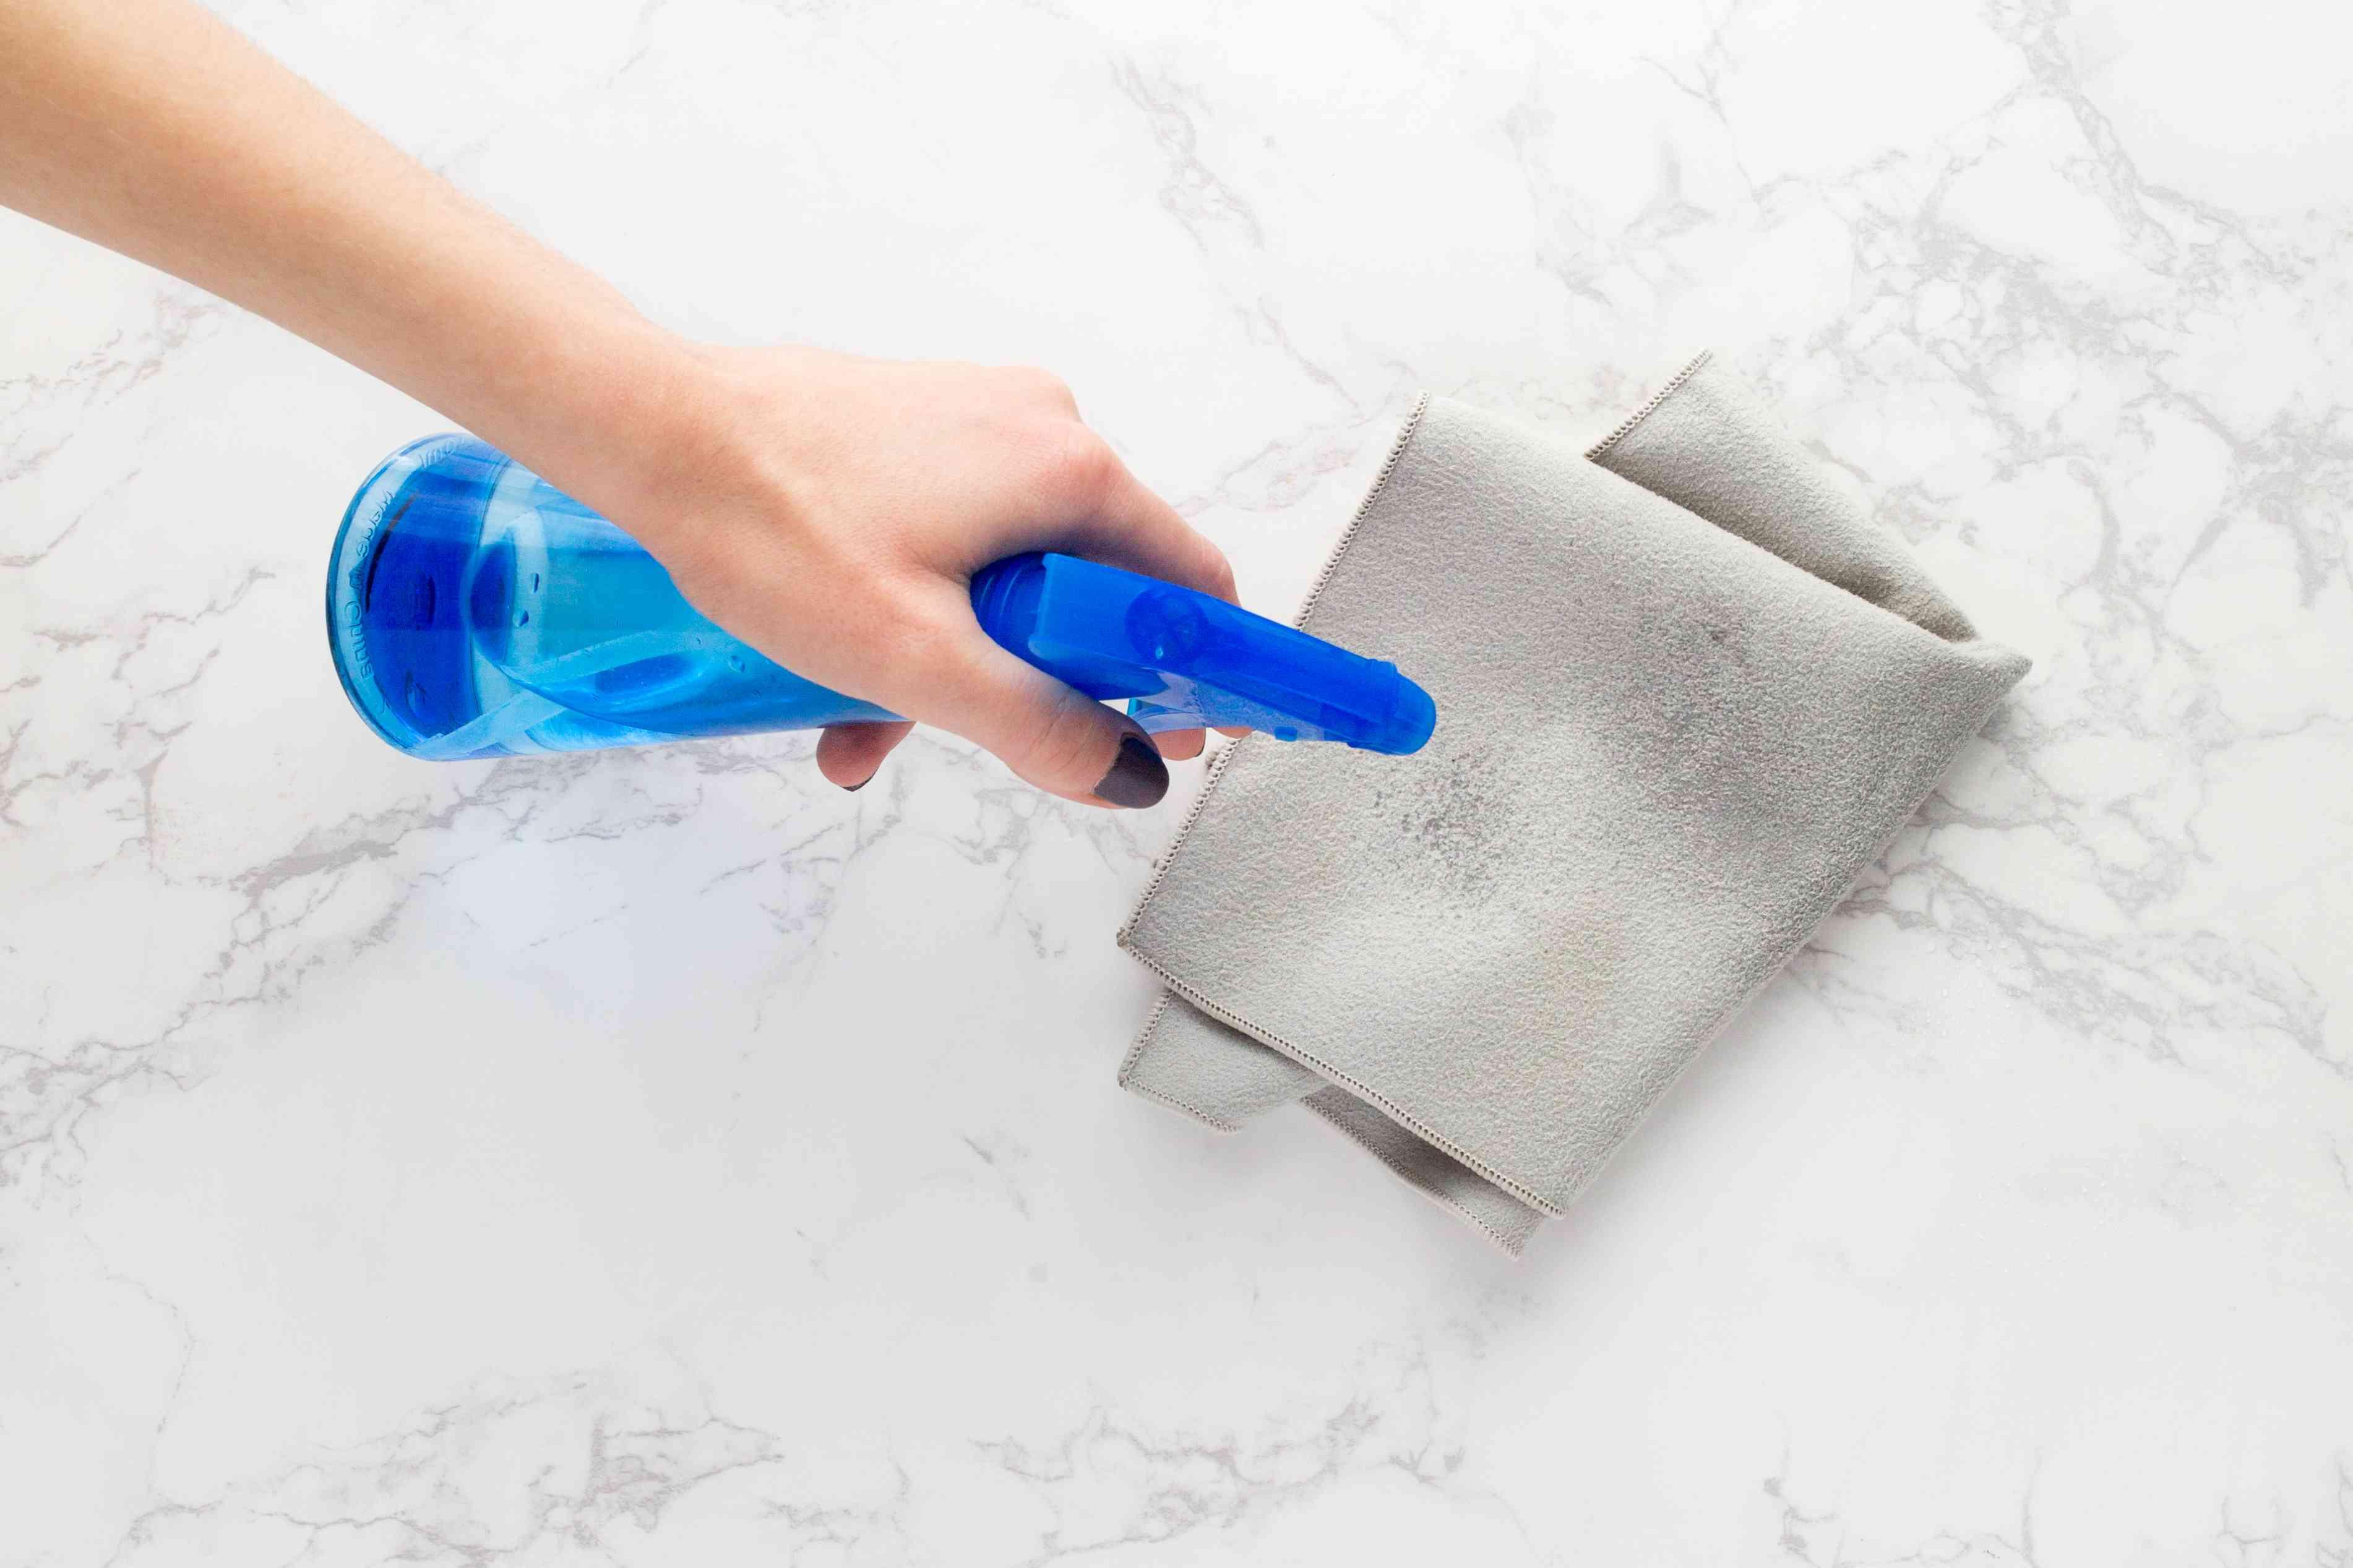 spraying a lint free microfiber cloth